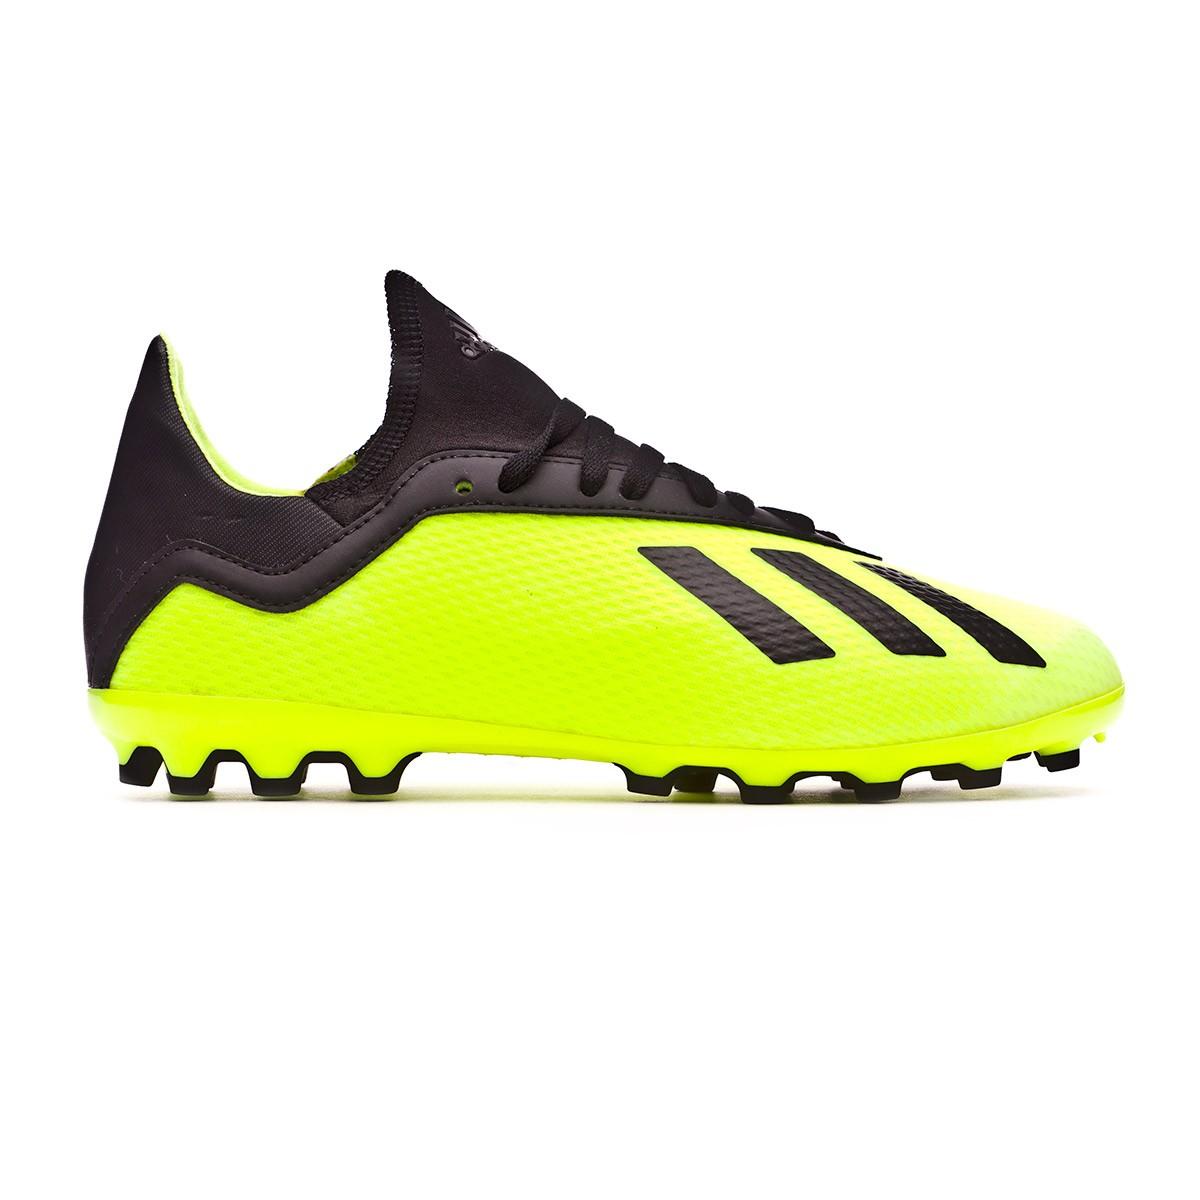 3a190f721f1 Zapatos de fútbol adidas X 18.3 AG Niño Solar yellow-Core black-Solar  yellow - Tienda de fútbol Fútbol Emotion